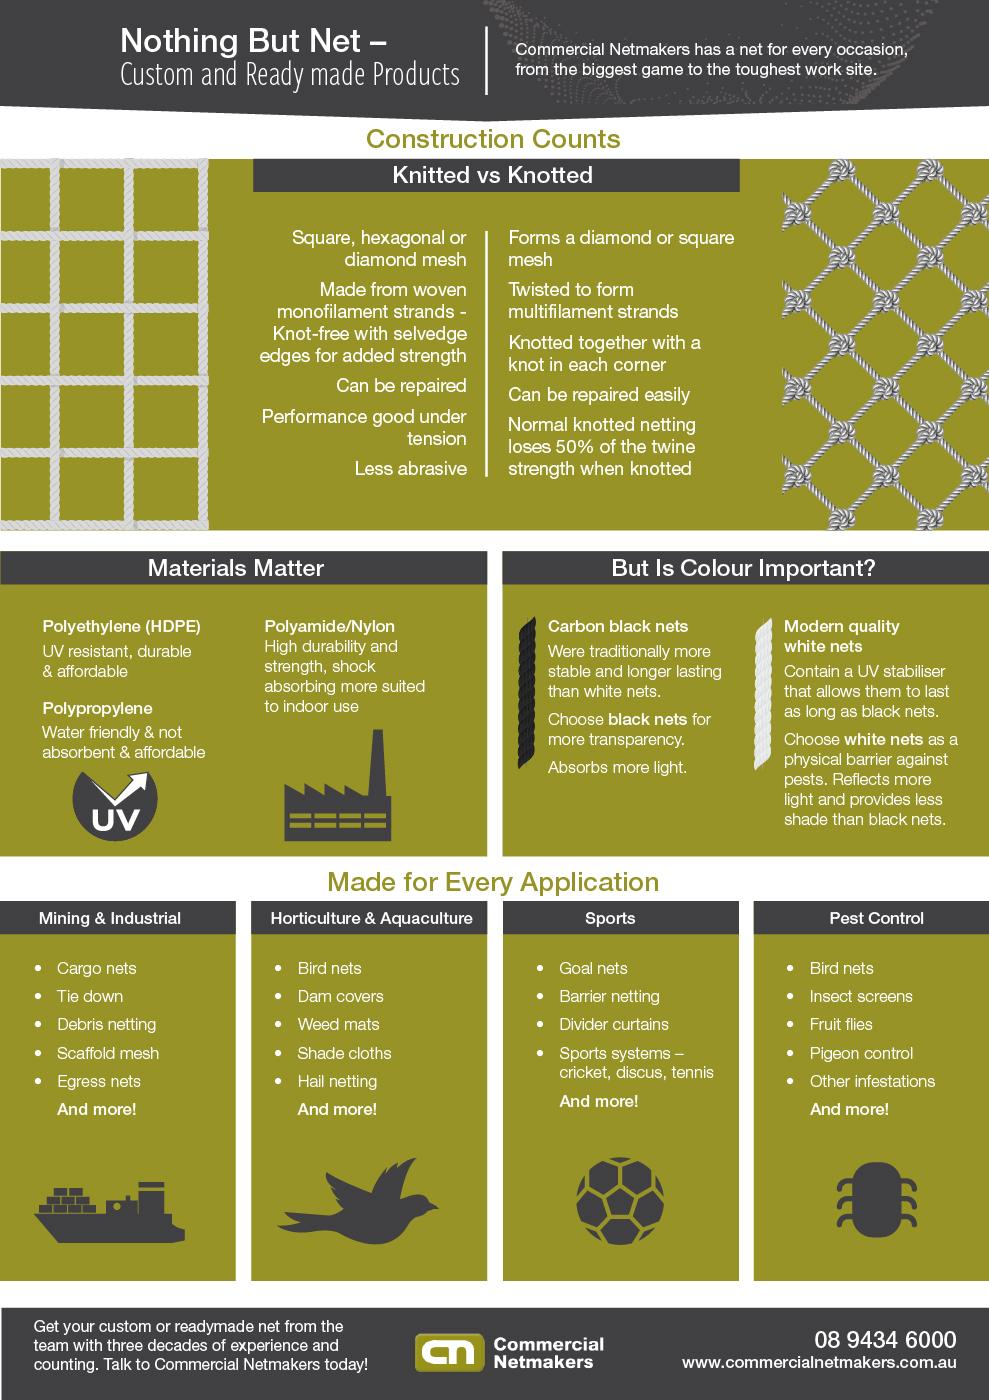 Infographic on custom made nets